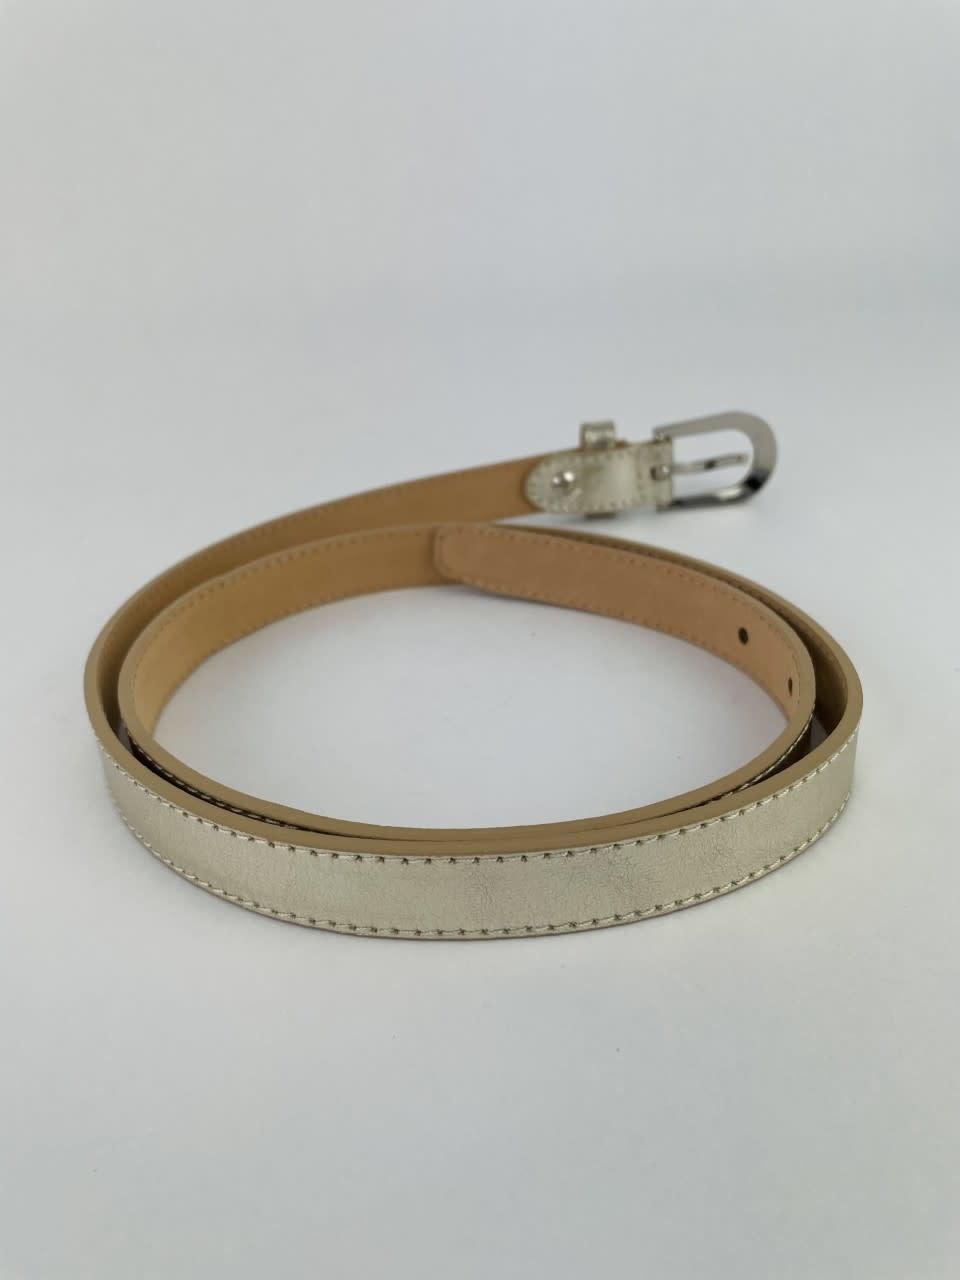 Etna metalic  genuine belt Gold-6